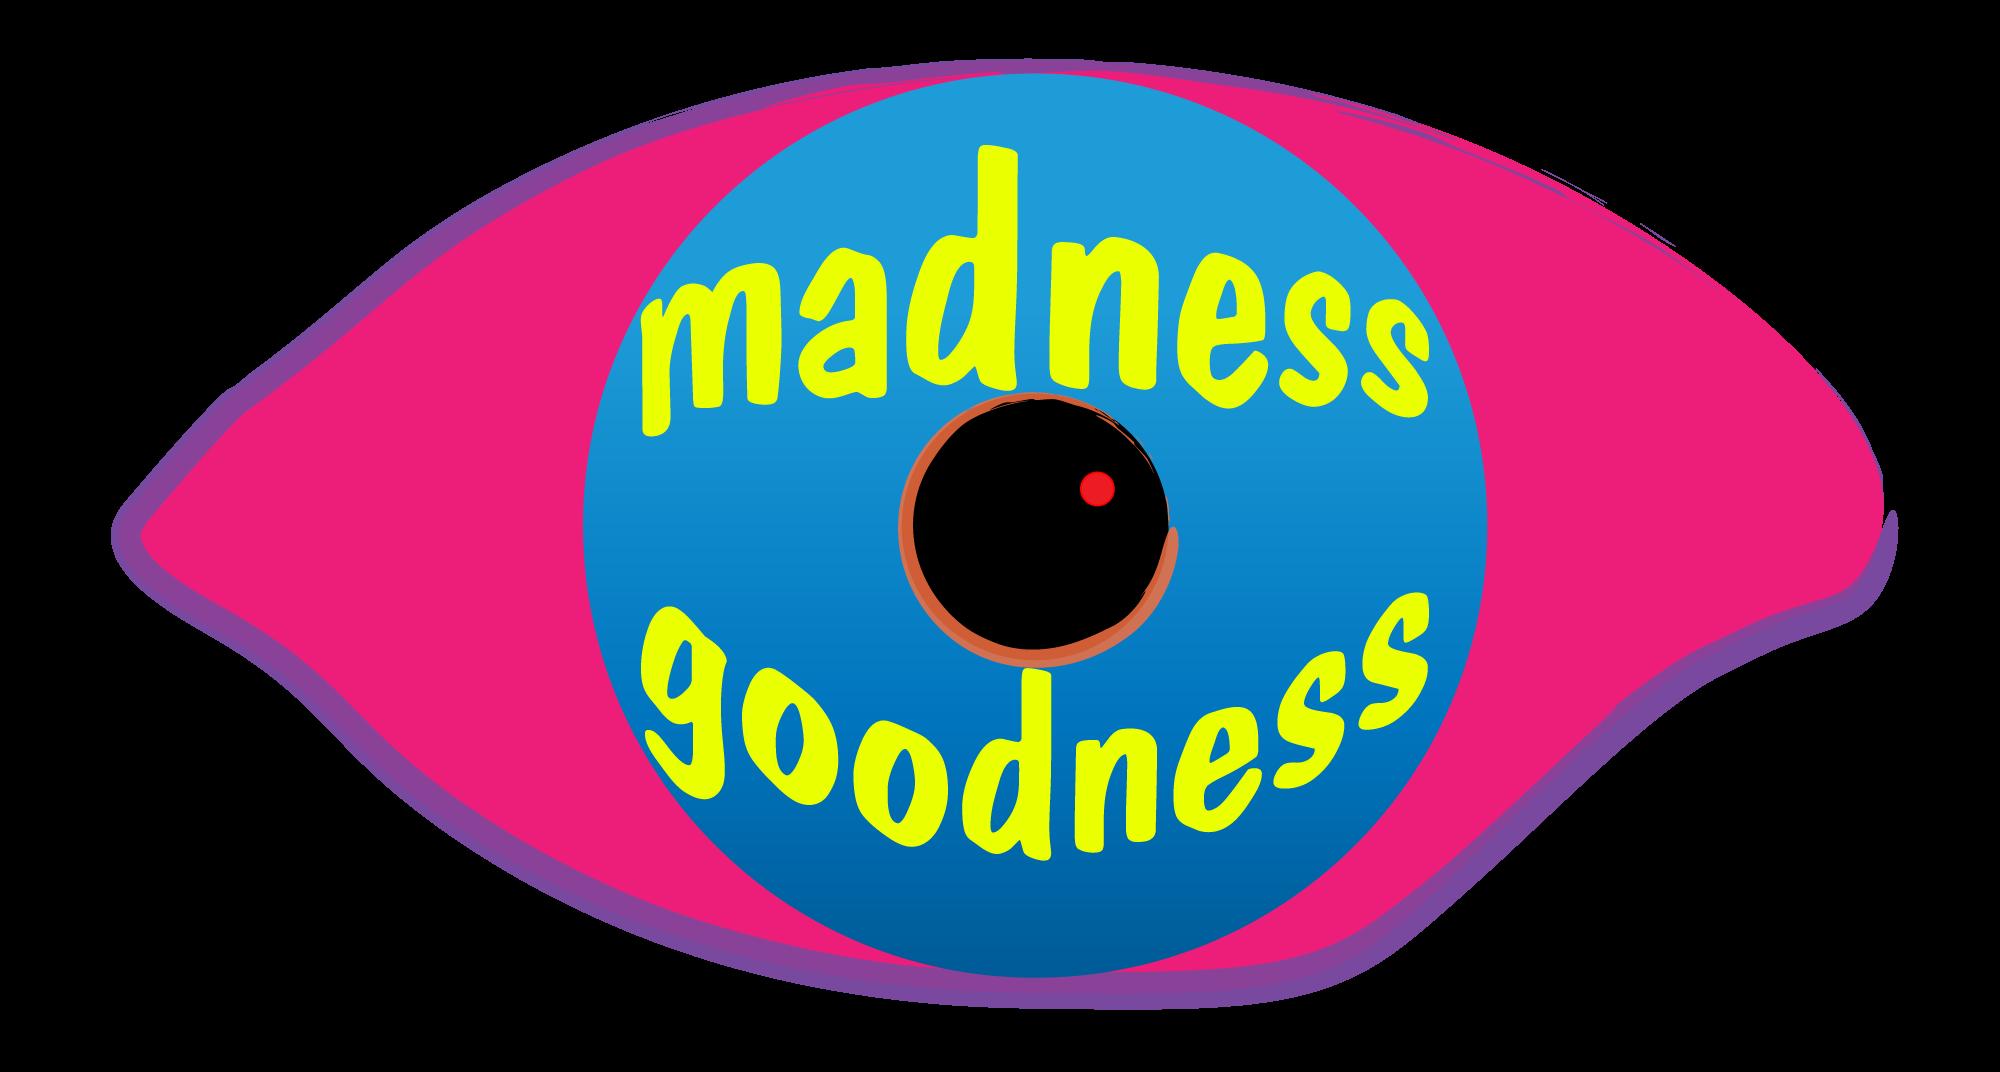 MADNESS GOODNESS